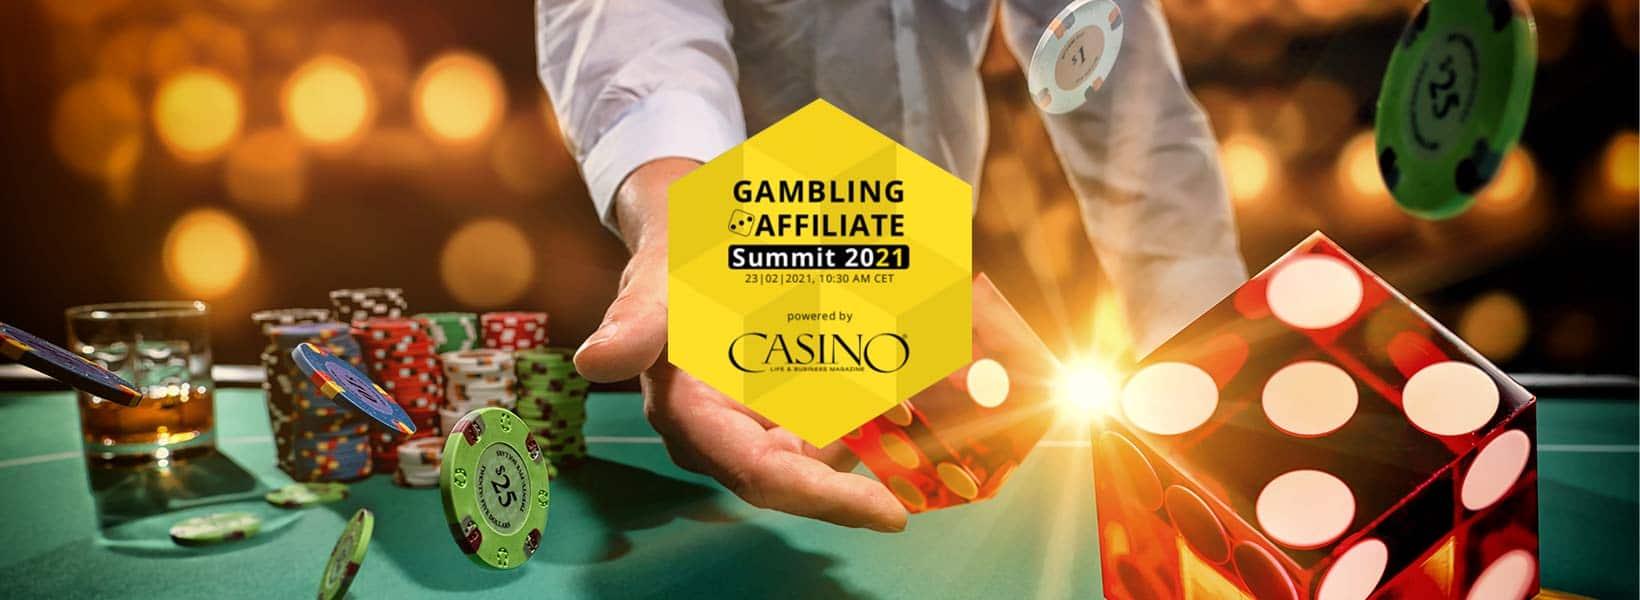 gambling affiliate summit 2021